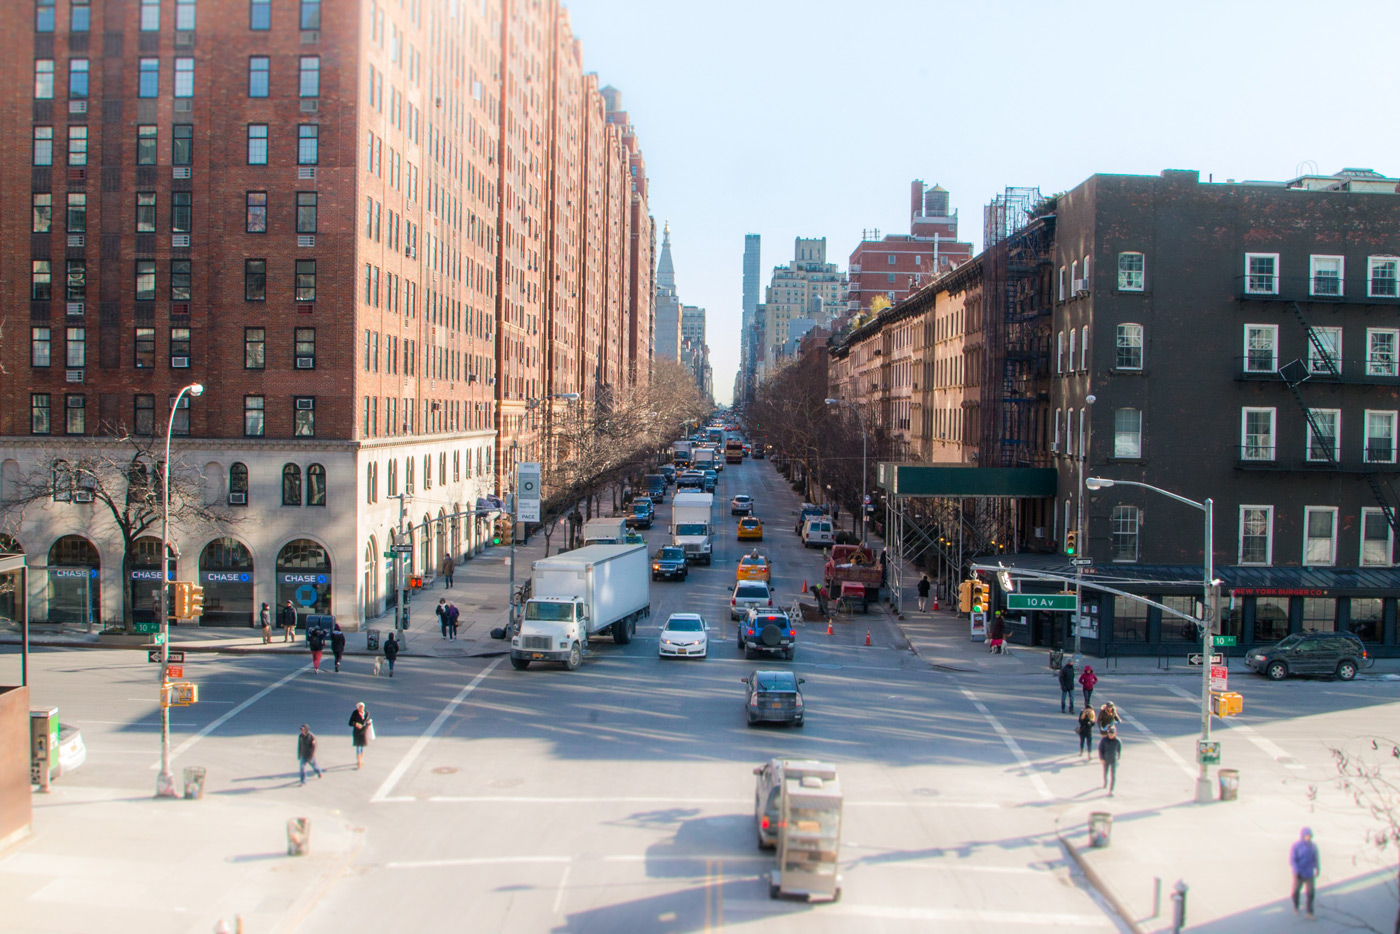 Chelsea streets